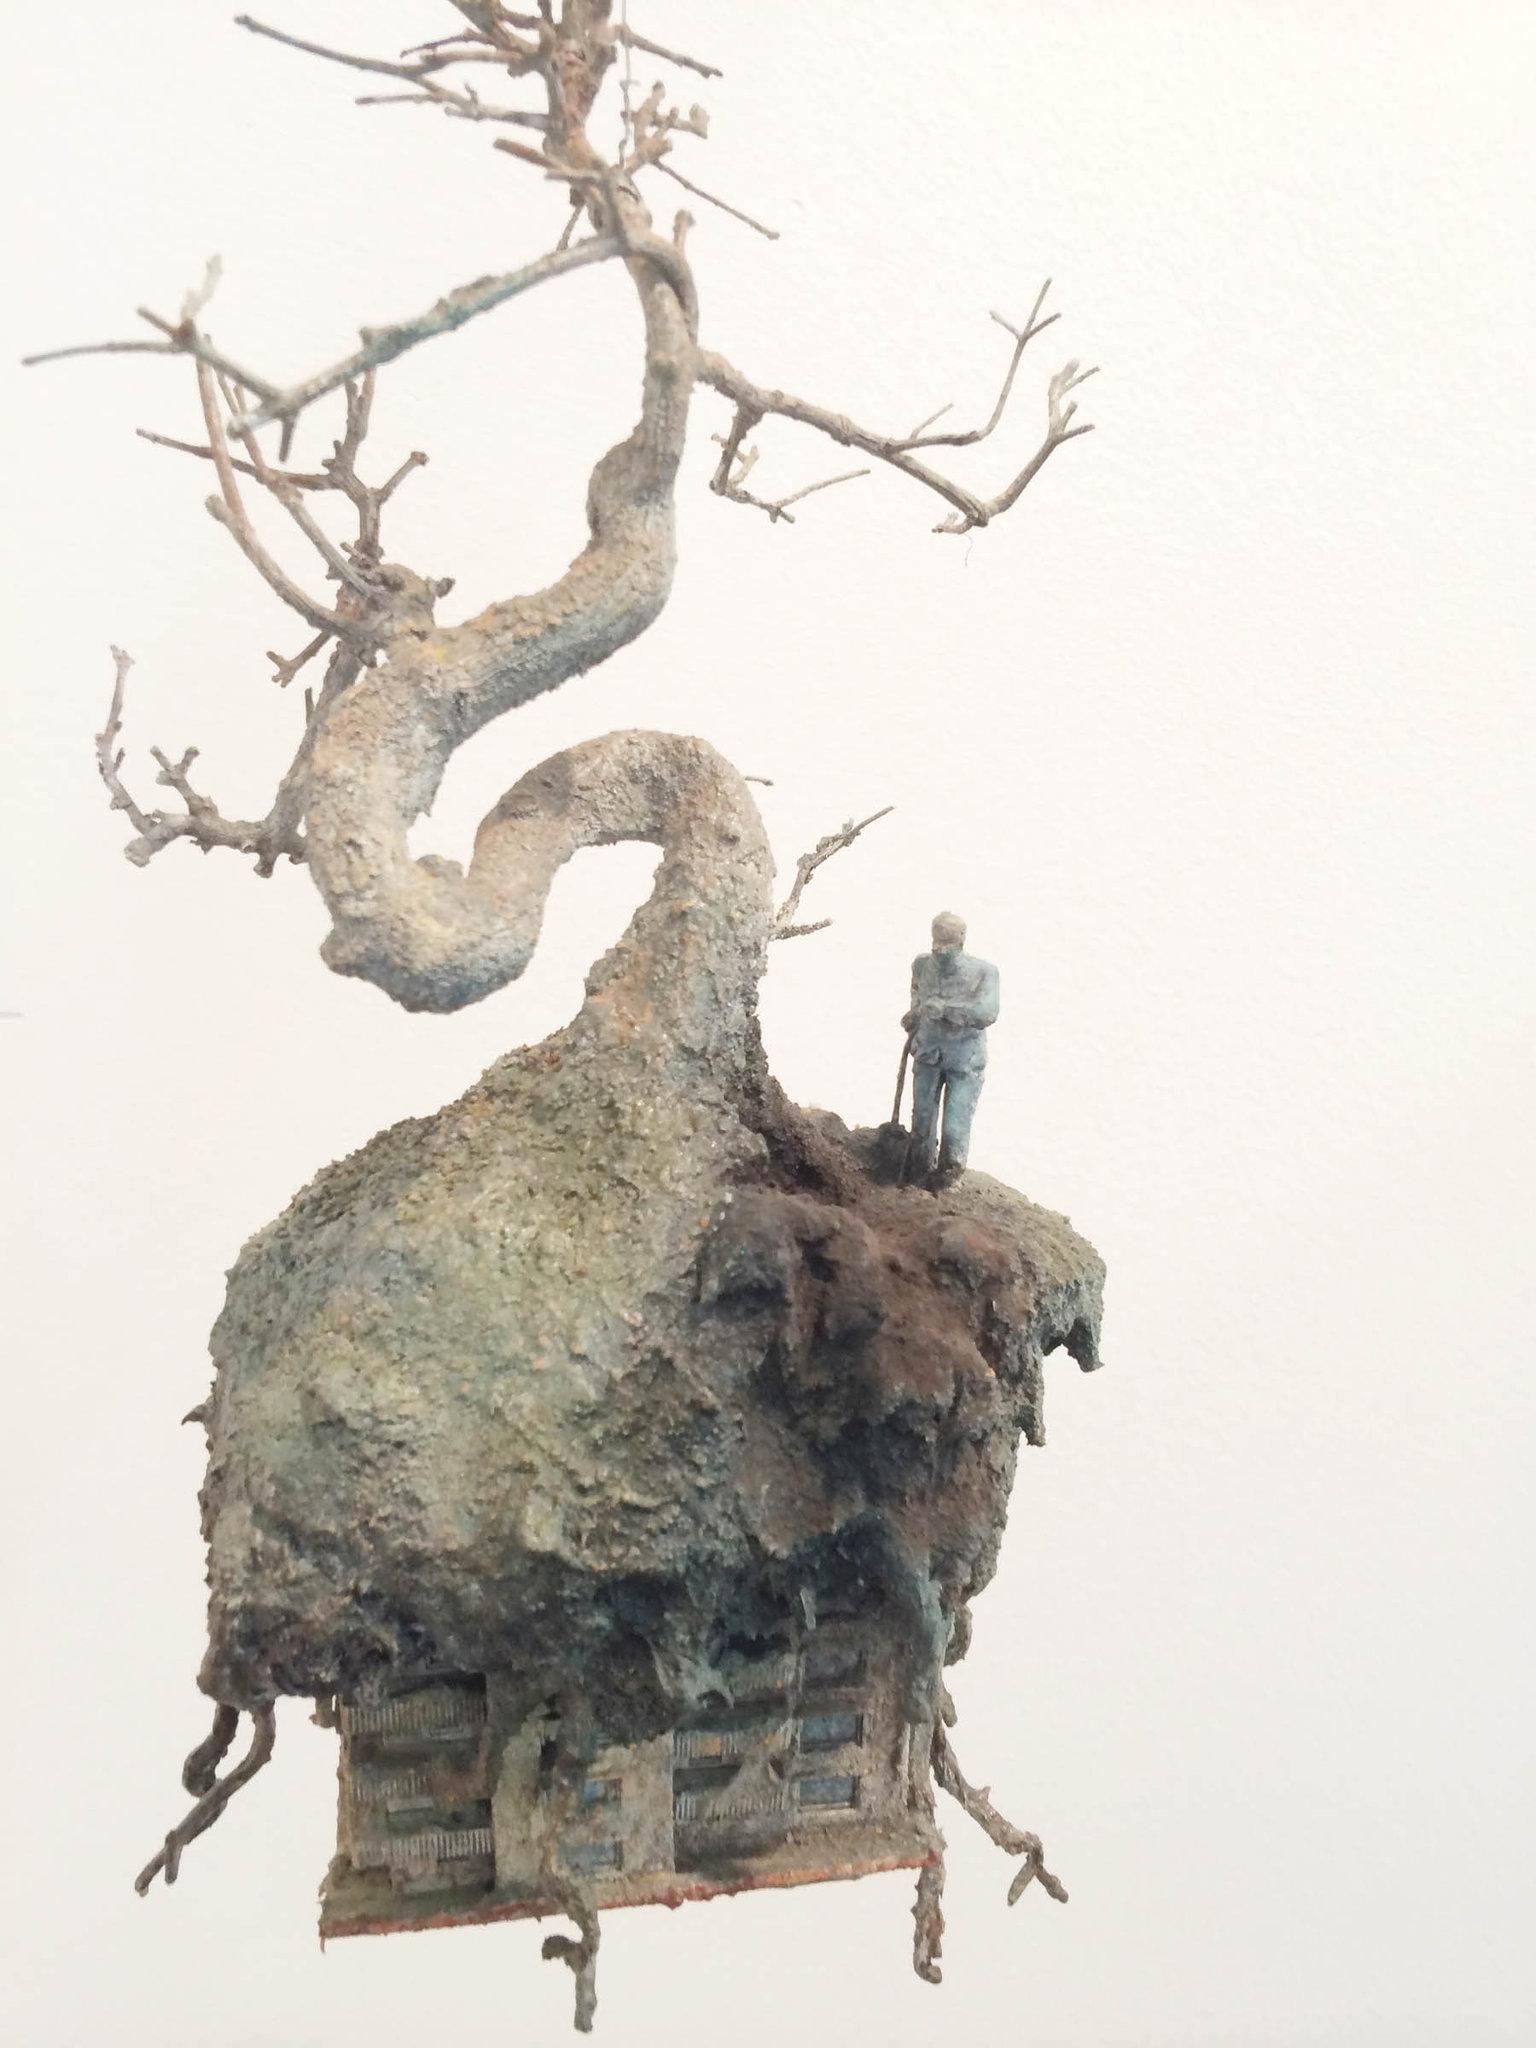 Patrick Bergsma, Het Gat/The Hole, 2014